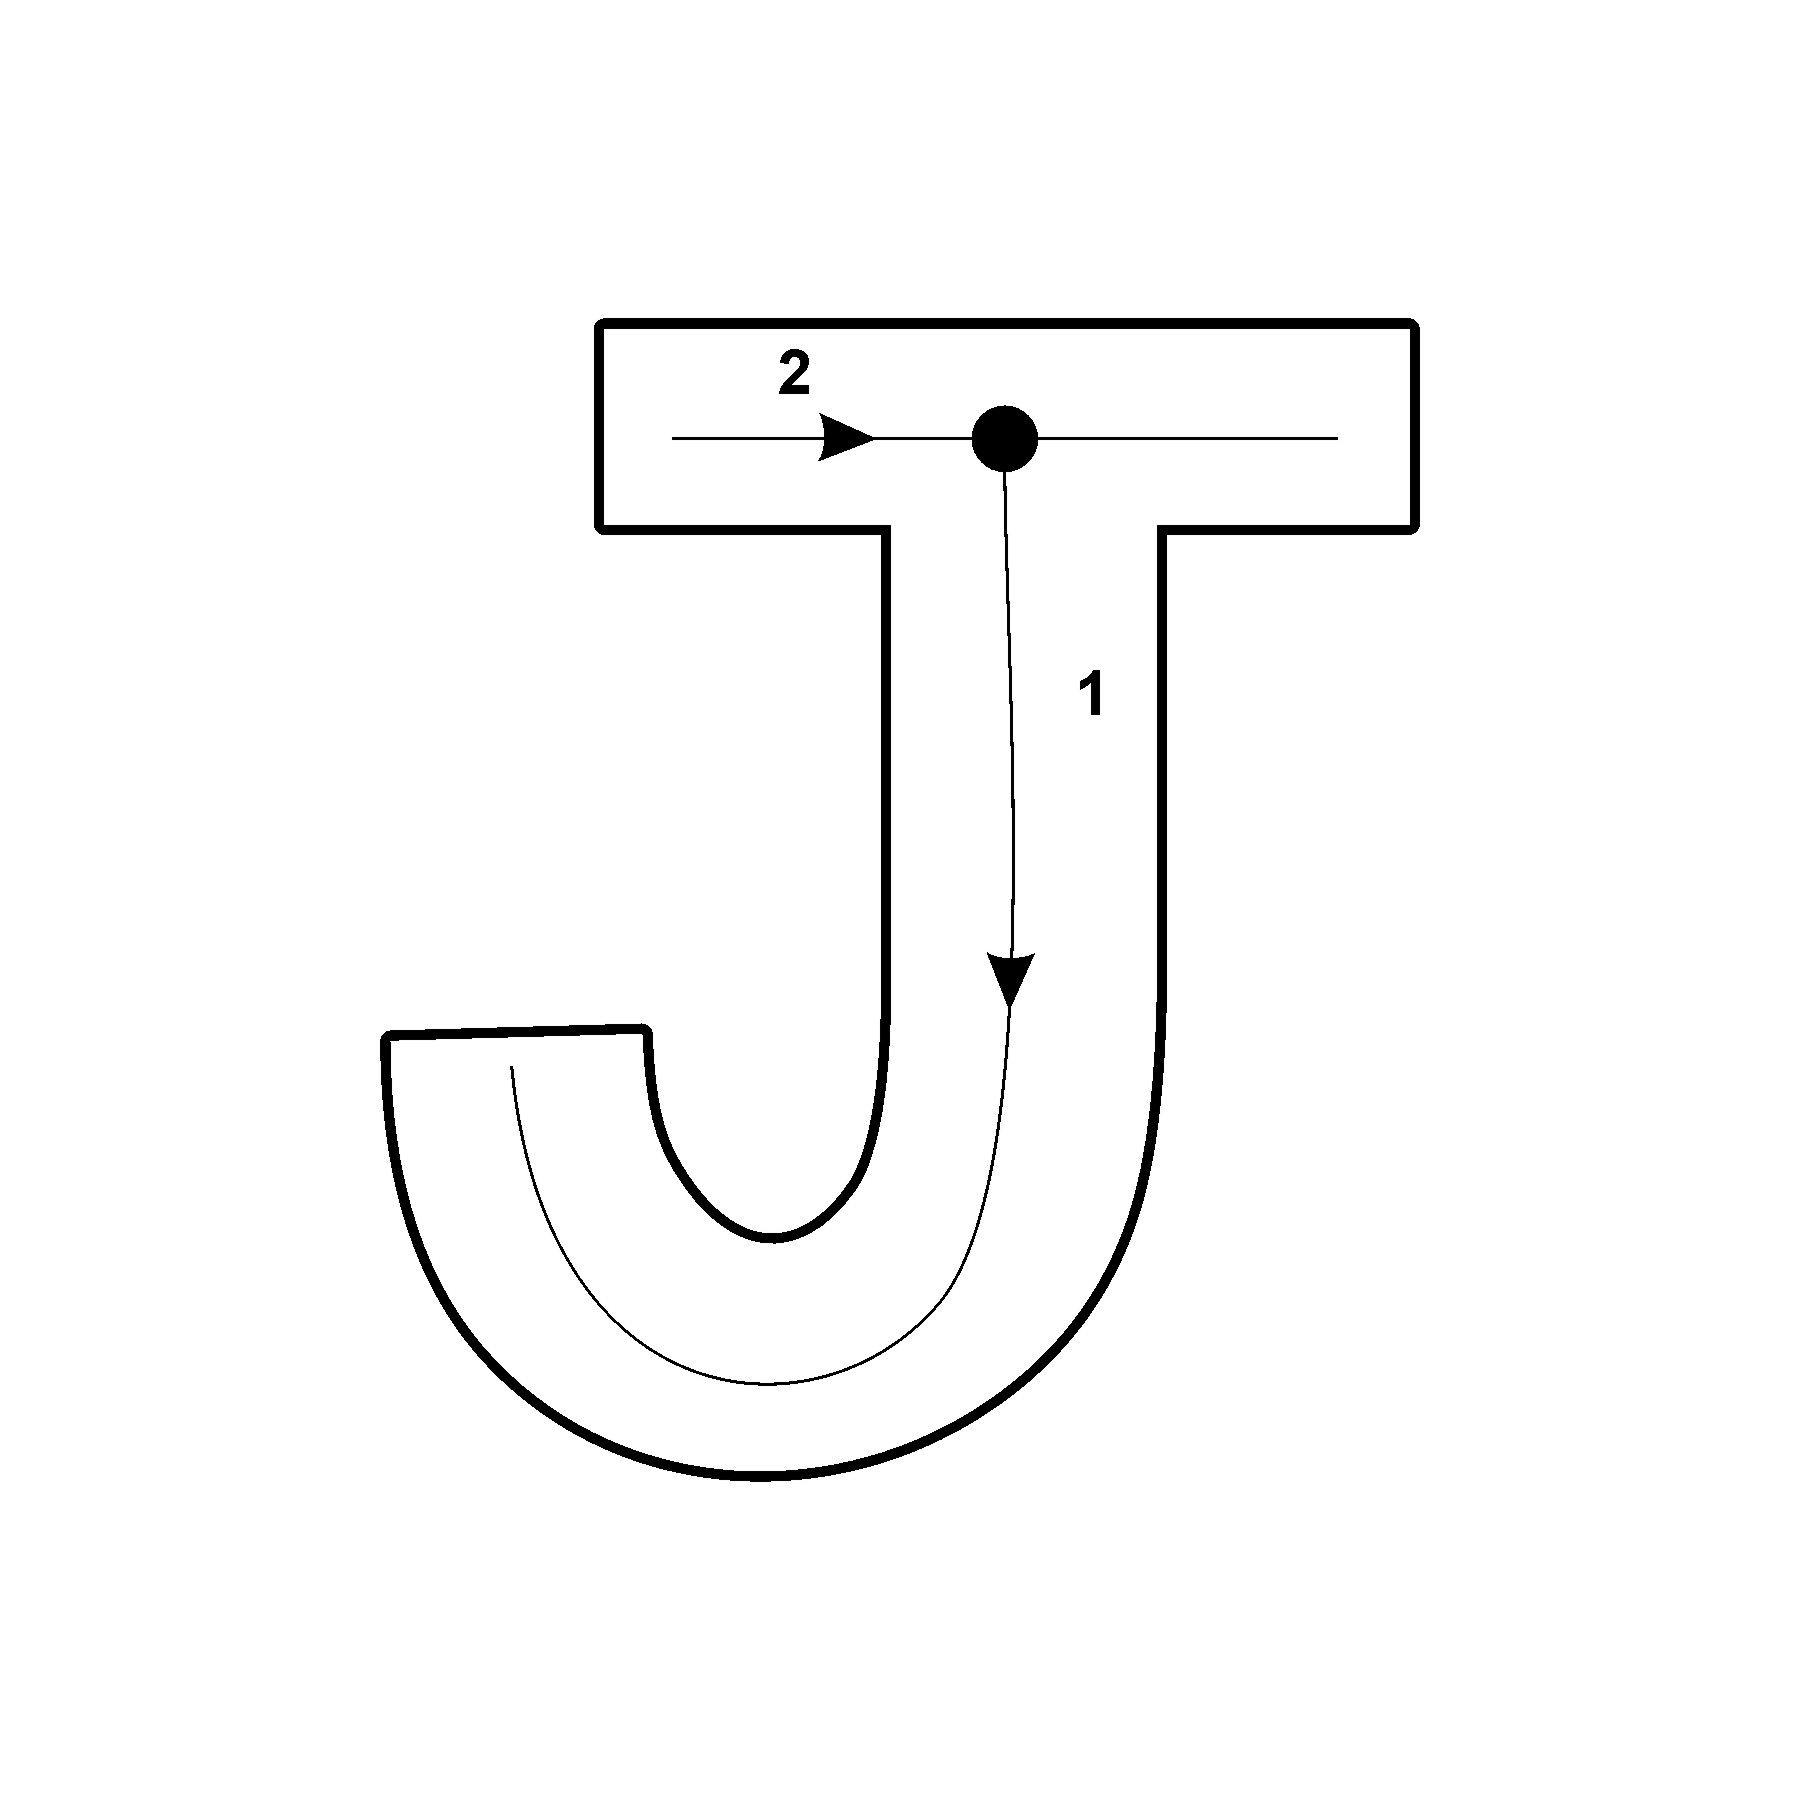 Capital Letter J with Arrow Lettering, Letter j, Capital